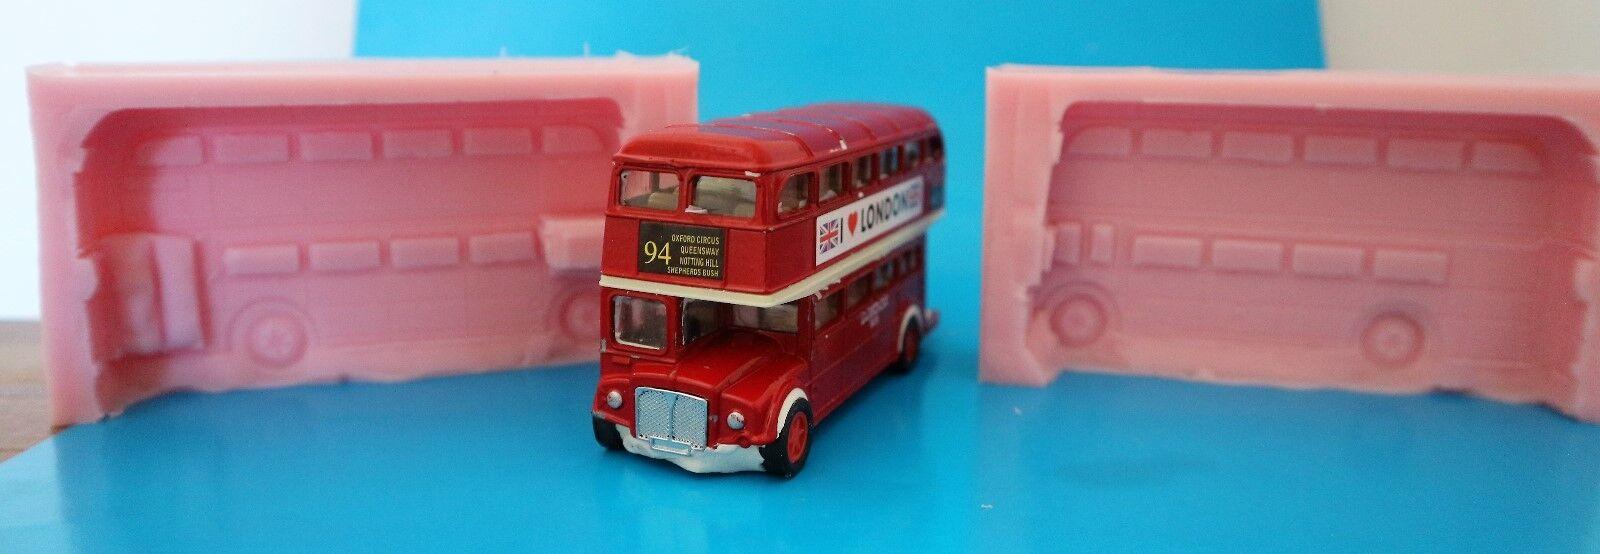 London Bus 3D Silikonform für Kuchendekoration, Schokolade, Ton Usw